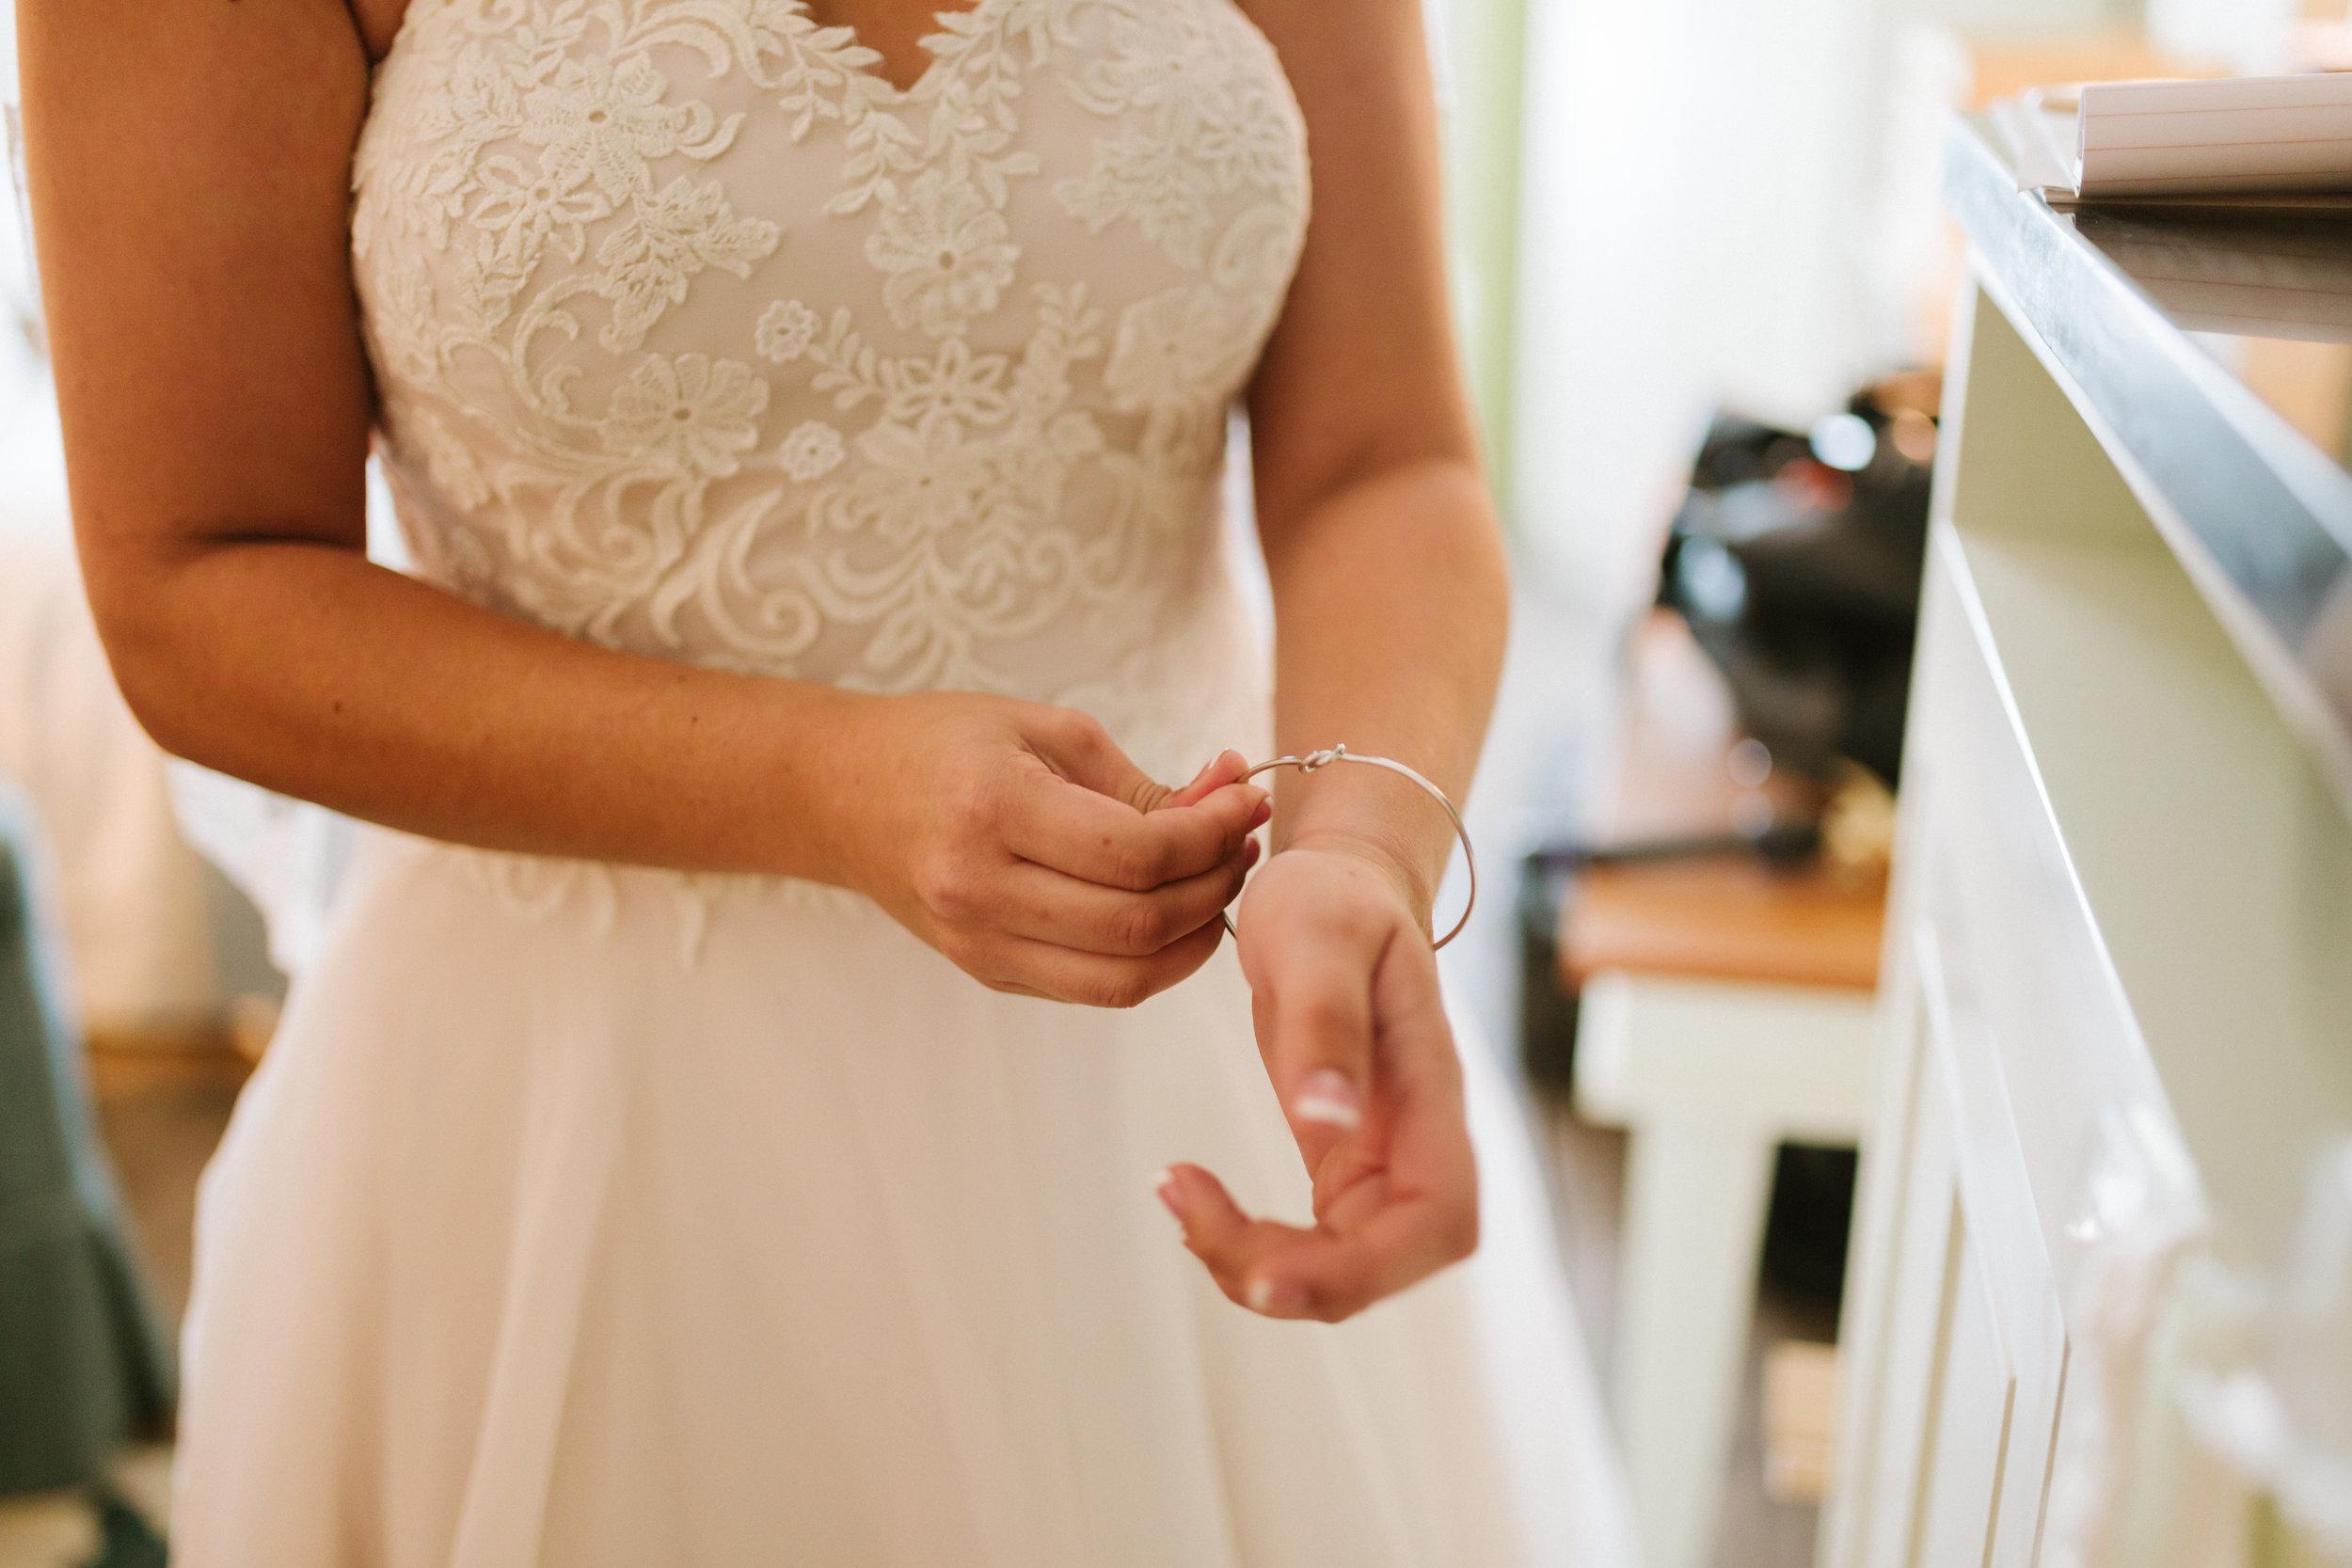 2017.10.14 Samantha and Matthew Crabtree Sarasota Wedding (89 of 708).jpg